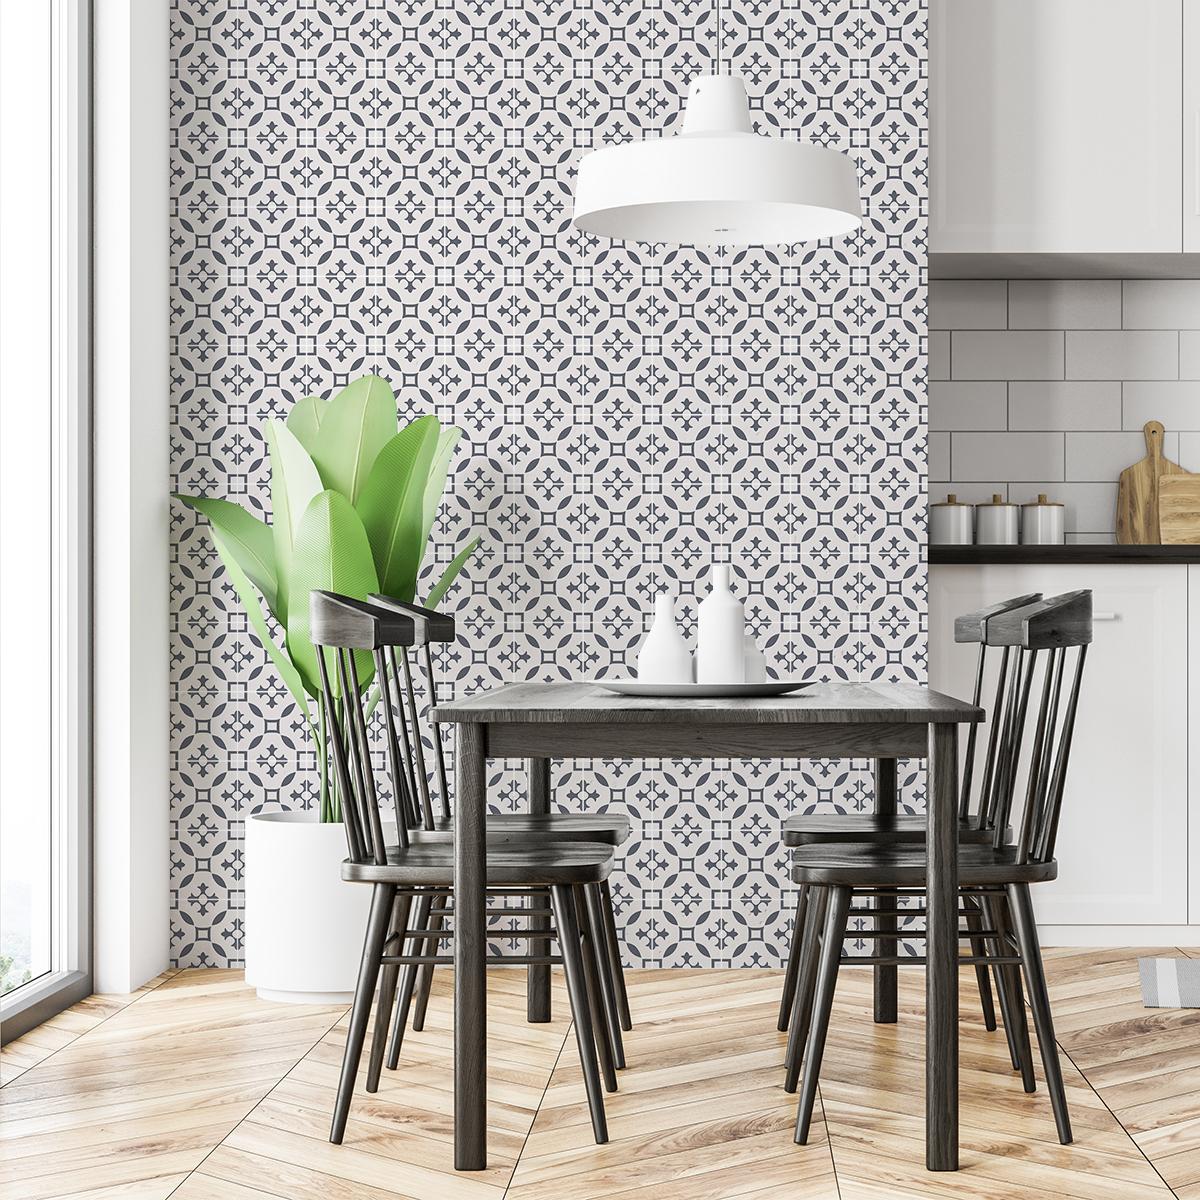 60 stickers carreaux de ciment azulejos l onina cuisine. Black Bedroom Furniture Sets. Home Design Ideas